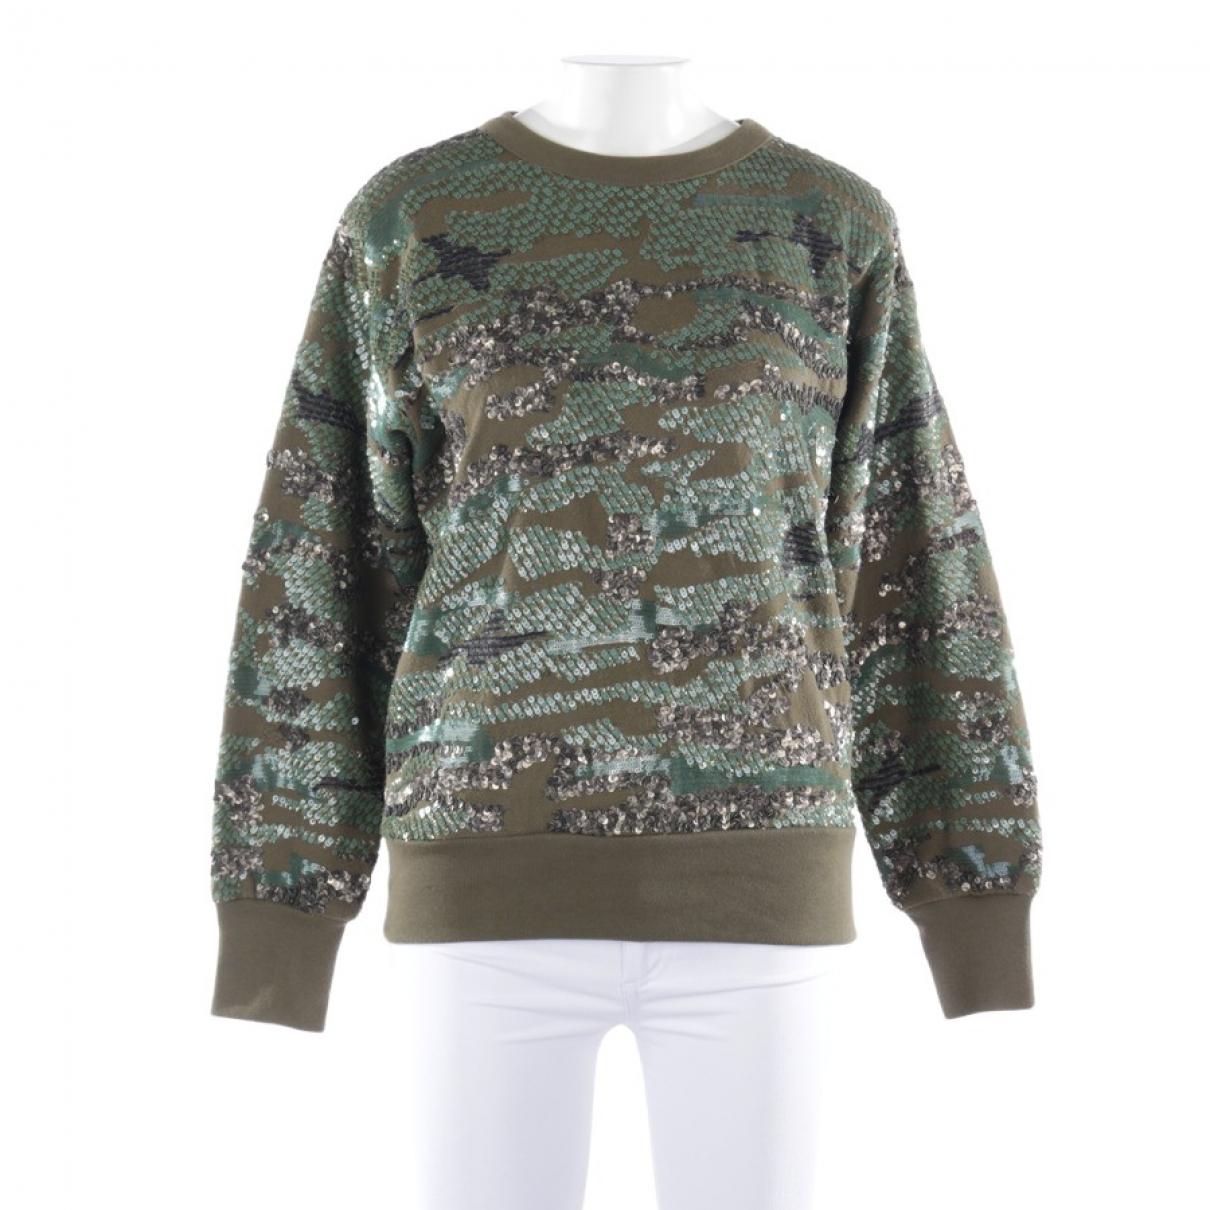 Isabel Marant - Pull   pour femme en cuir - vert